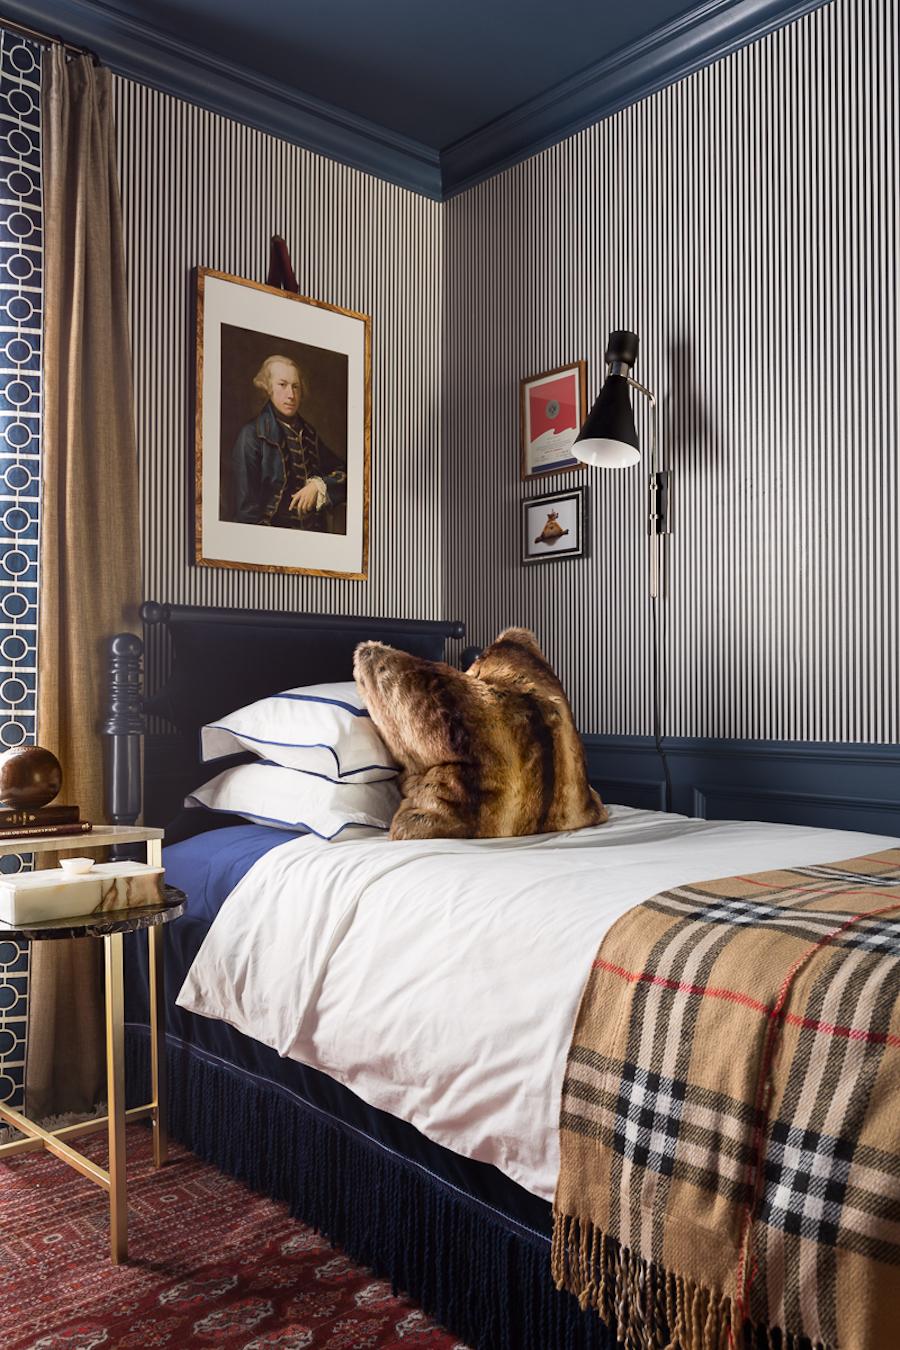 Jewel_Marlowe-boys-bedroom-saturday6